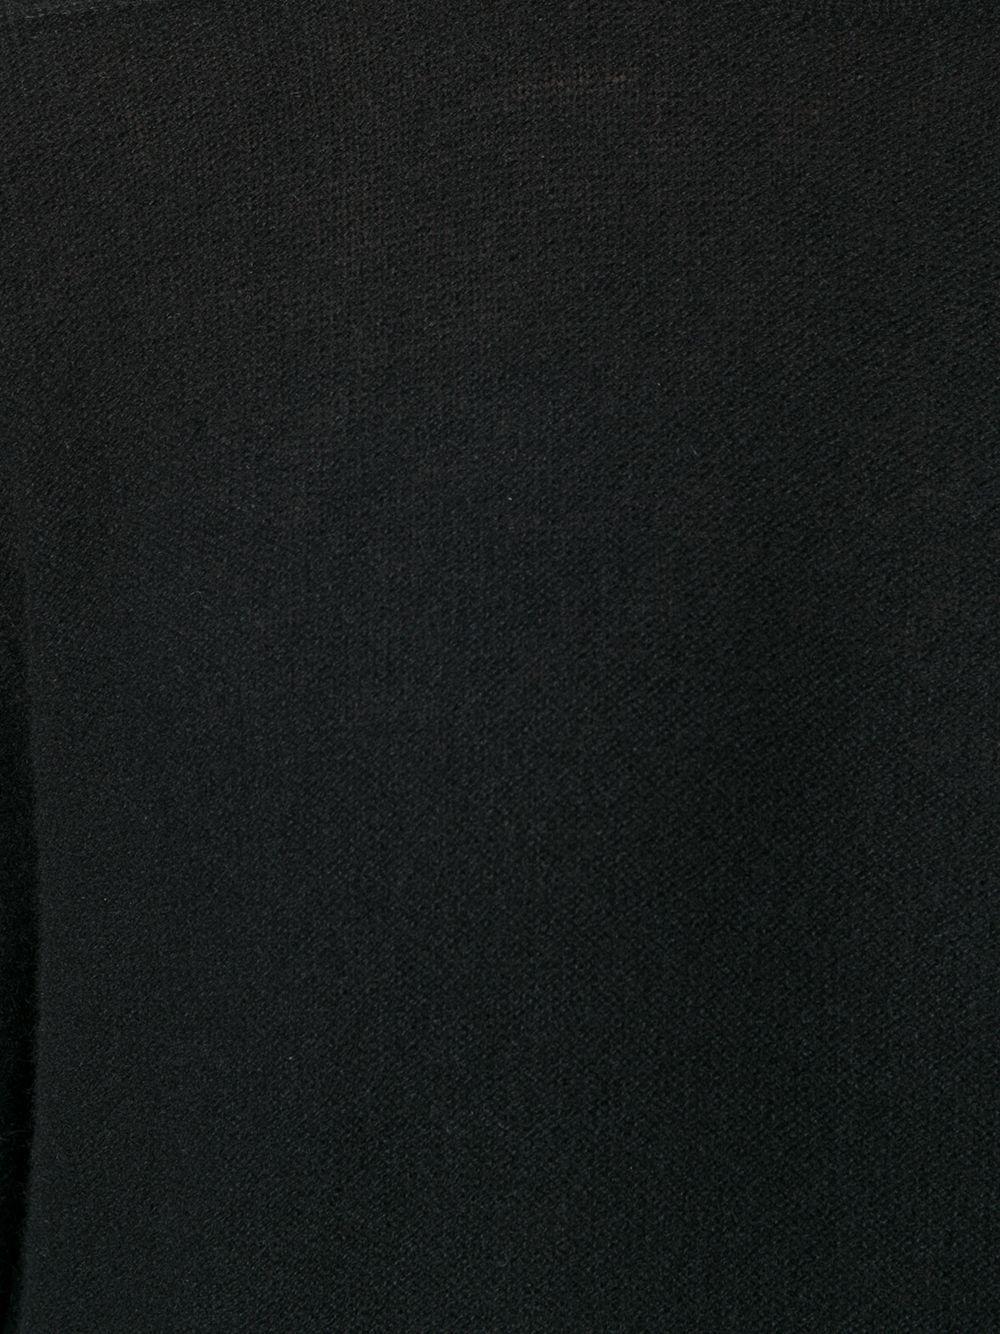 Pringle Of Scotland | Pringle of Scotland джемпер с рельефными швами на плечах | Clouty